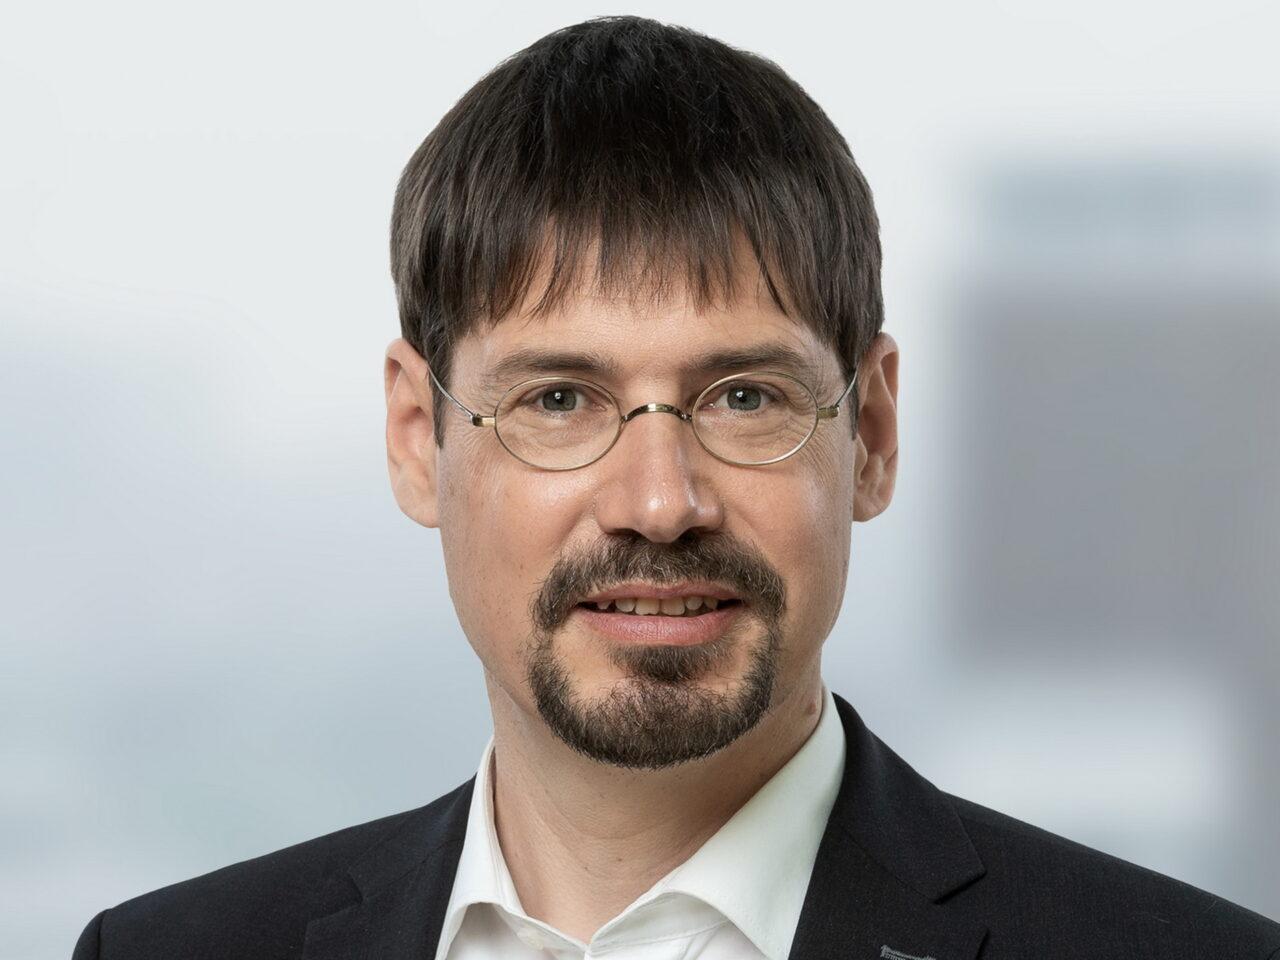 https://intelligent-investors.de/wp-content/uploads/2021/07/EB-SIM_Foto_Bernhard-Graeber_20210715_frei_2-1280x960.jpg